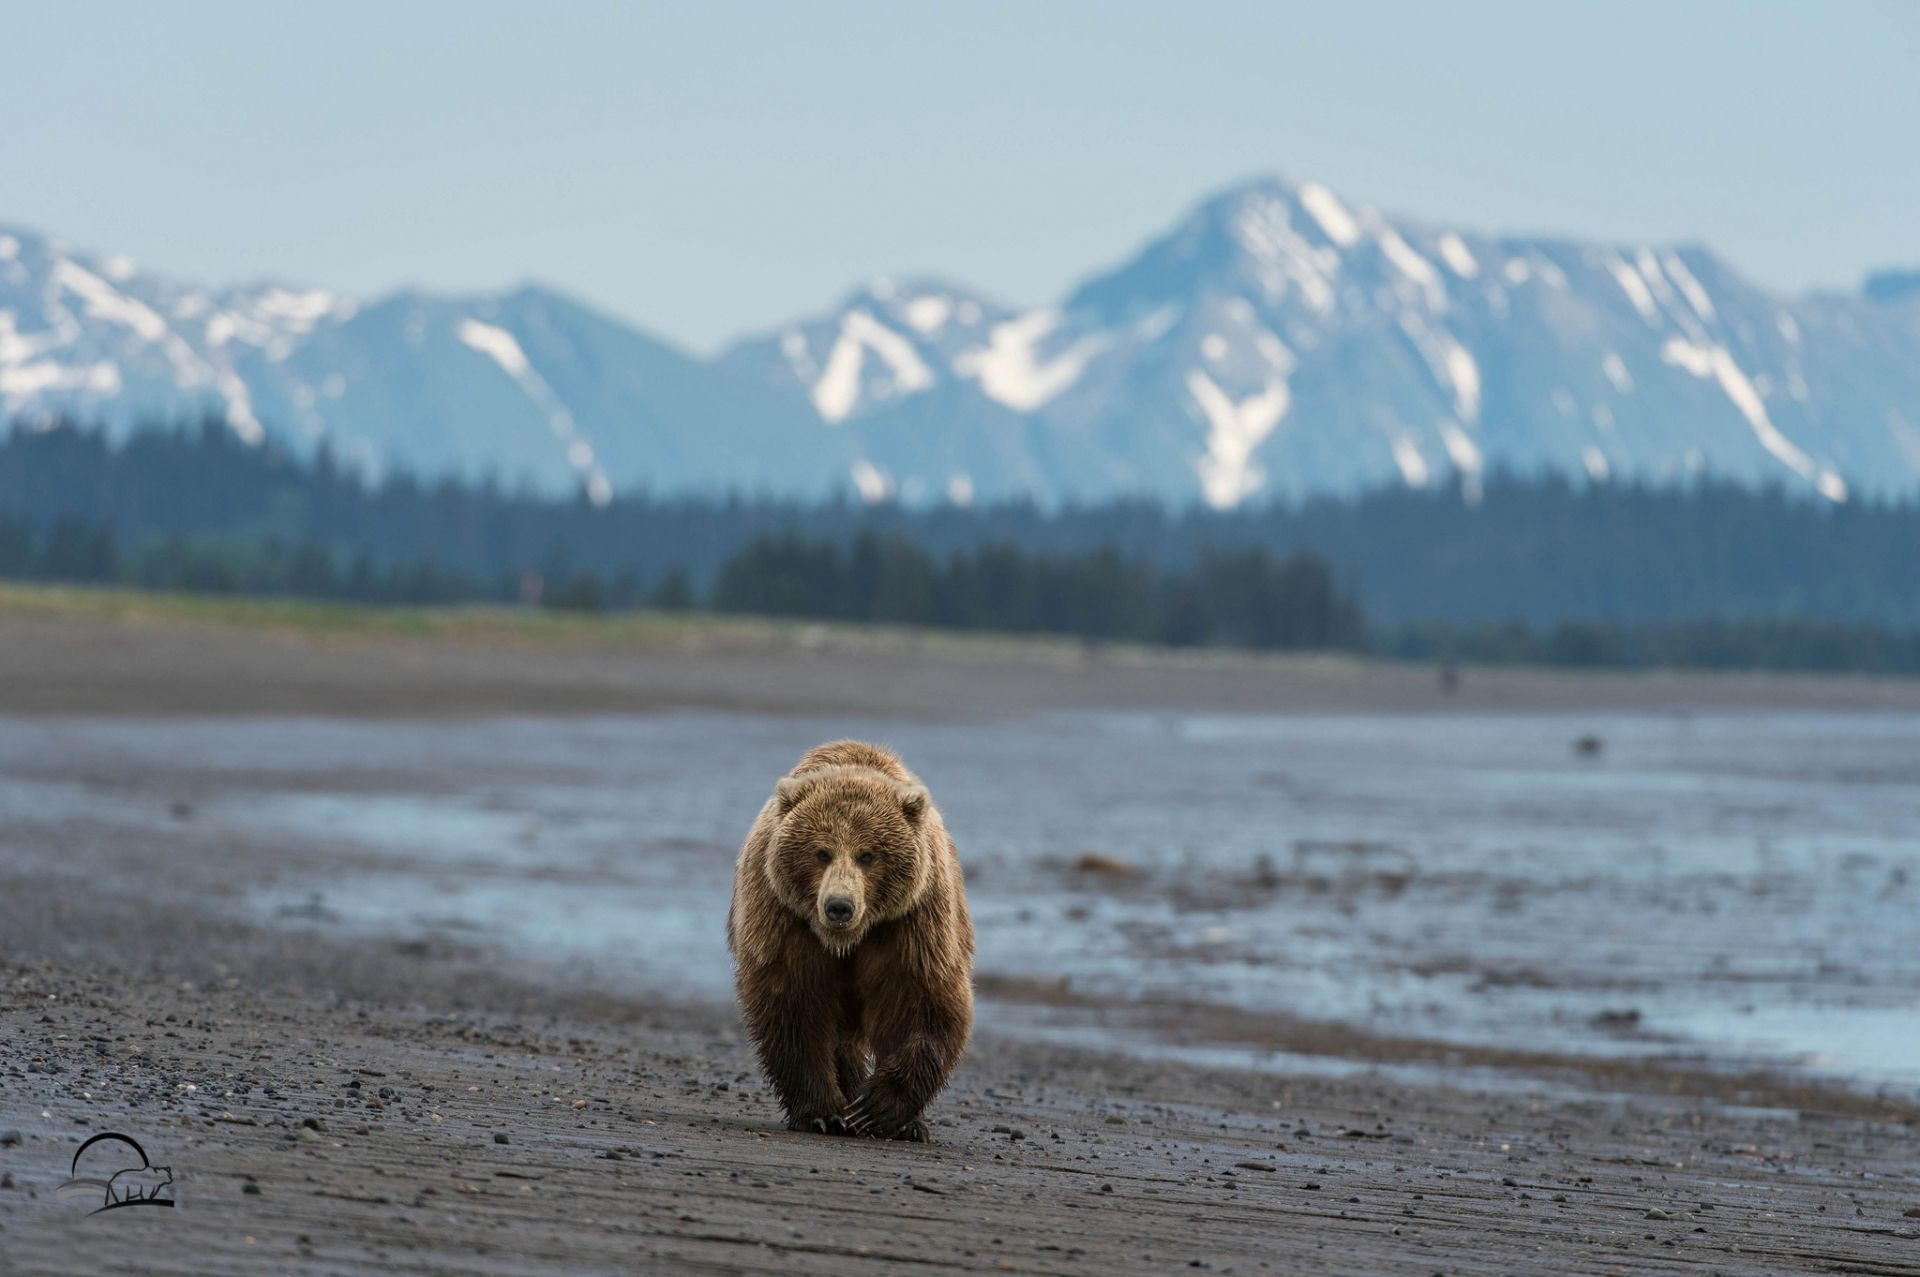 Alaskan Brown Bear Silhouetted Against Mount Katolinat, Alaska  № 1442490  скачать